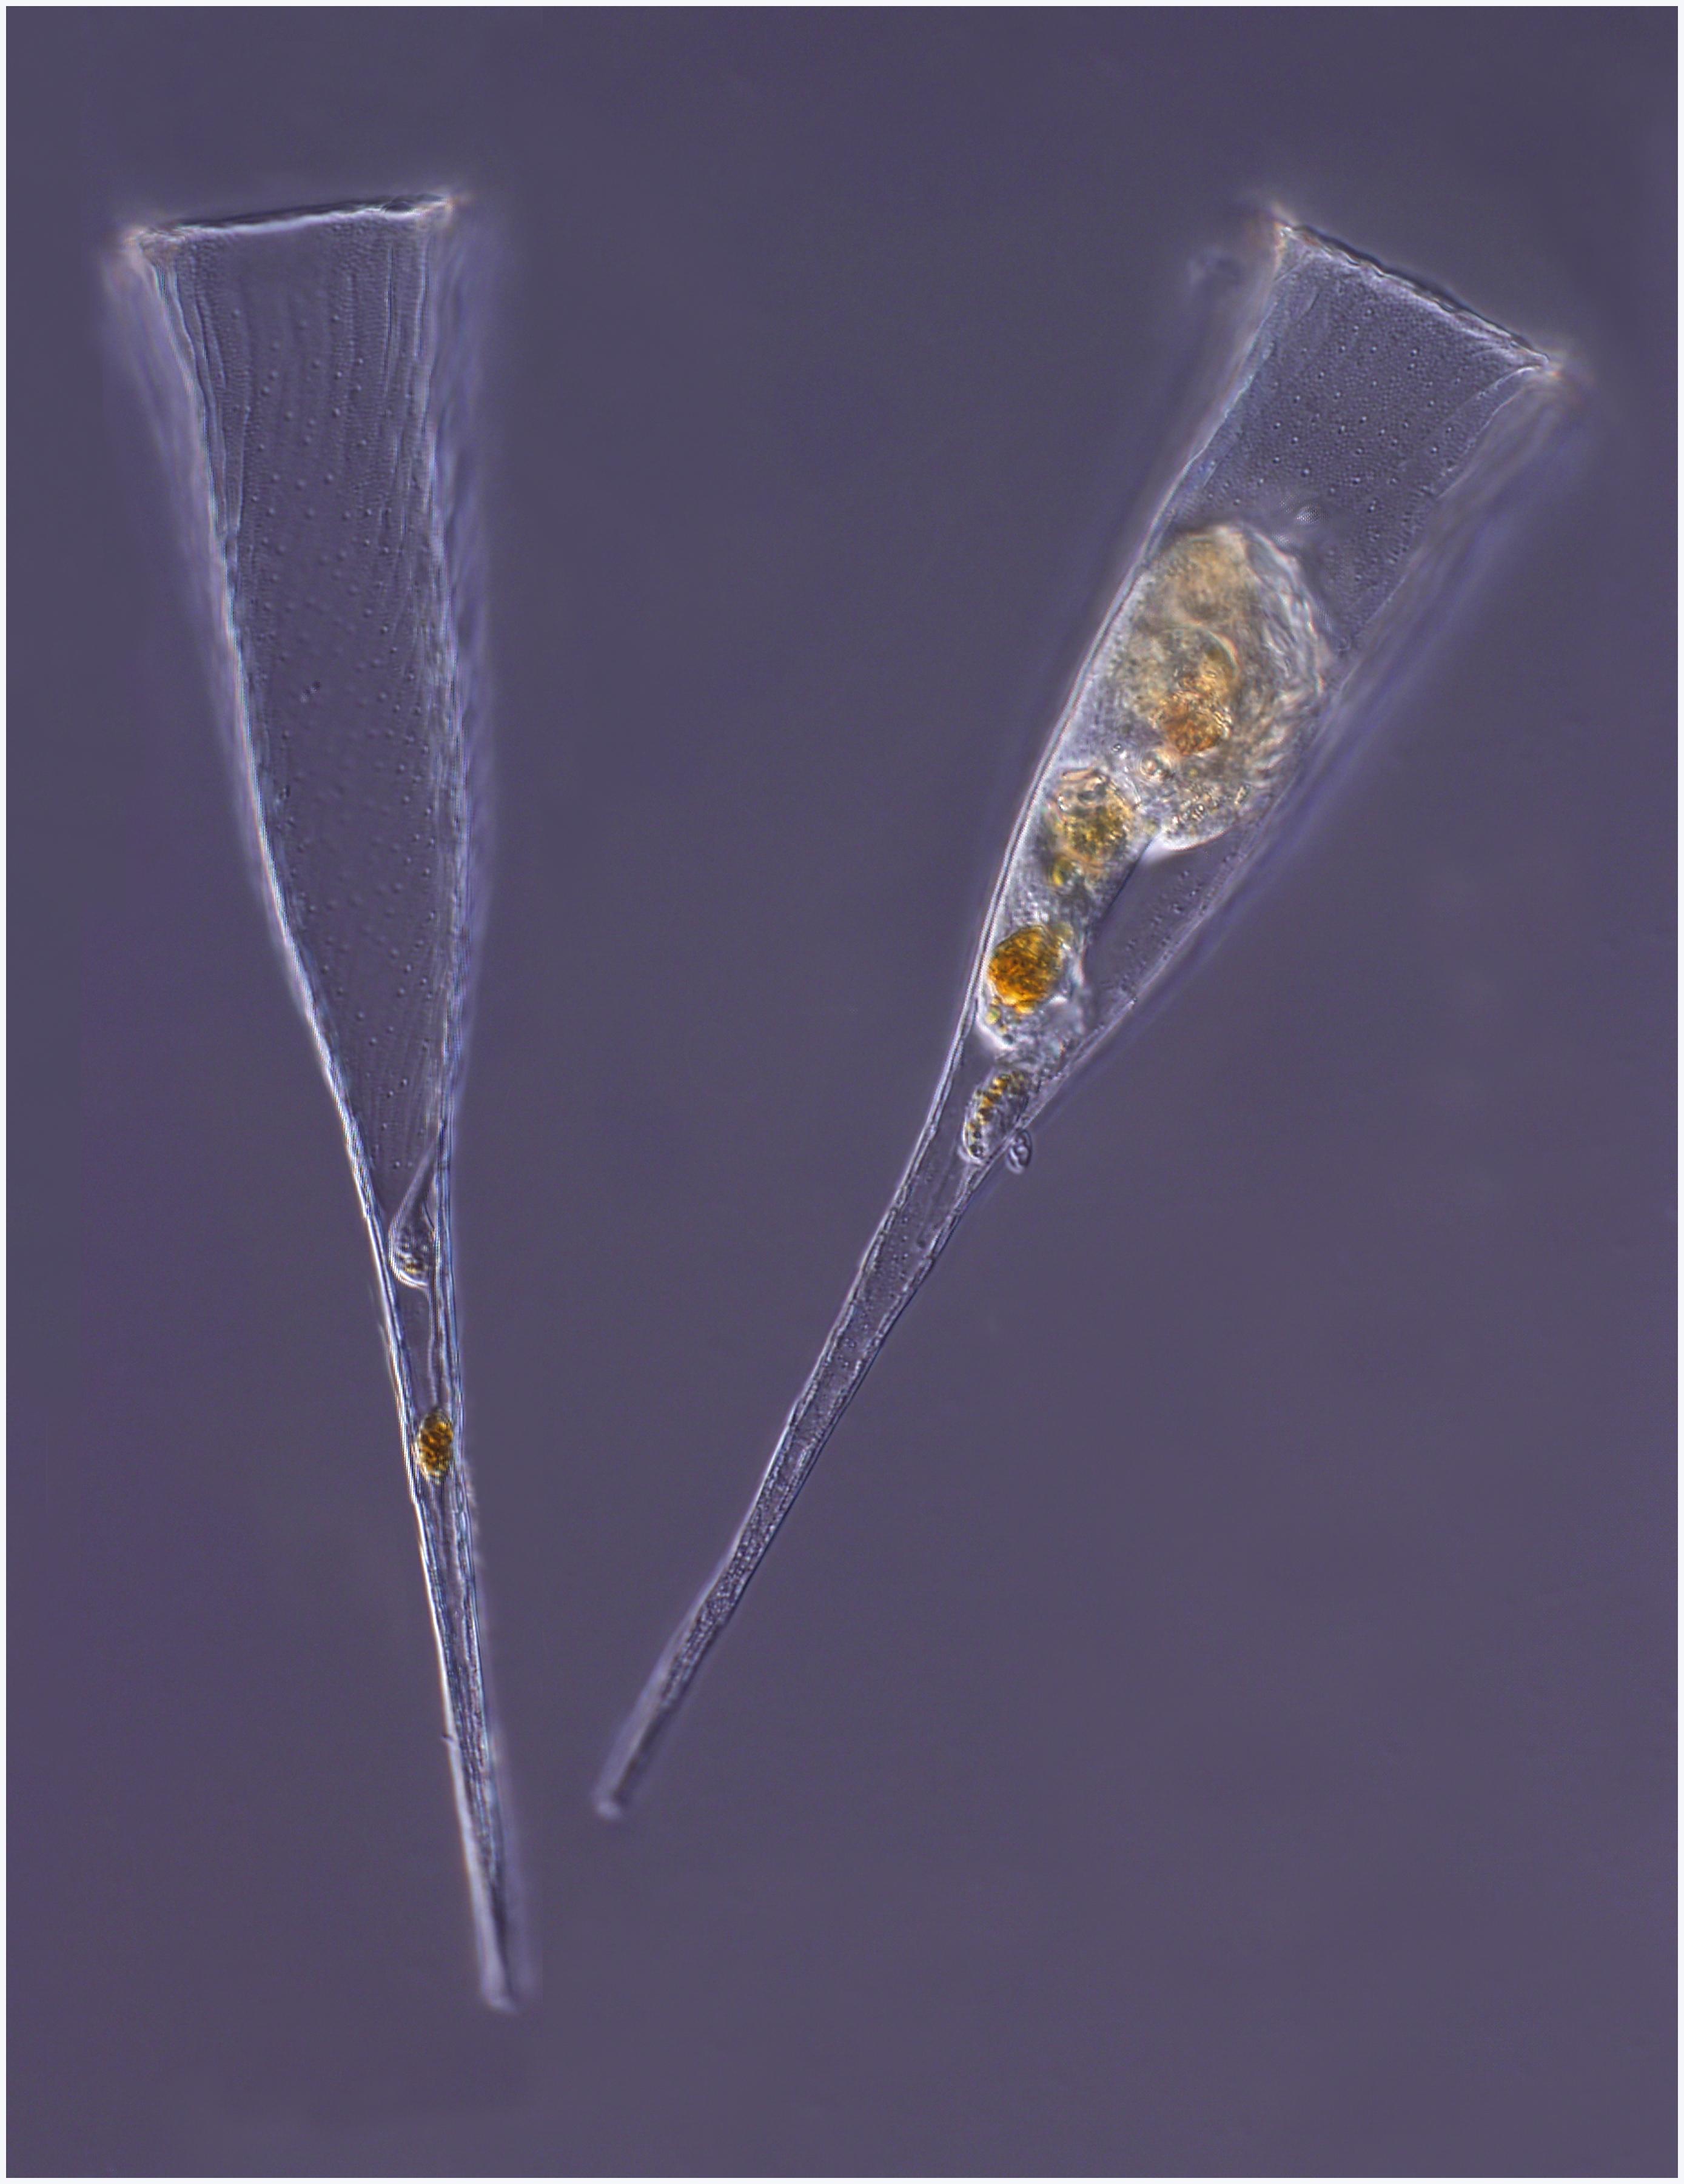 Image of <i>Rhabdonella spiralis</i>